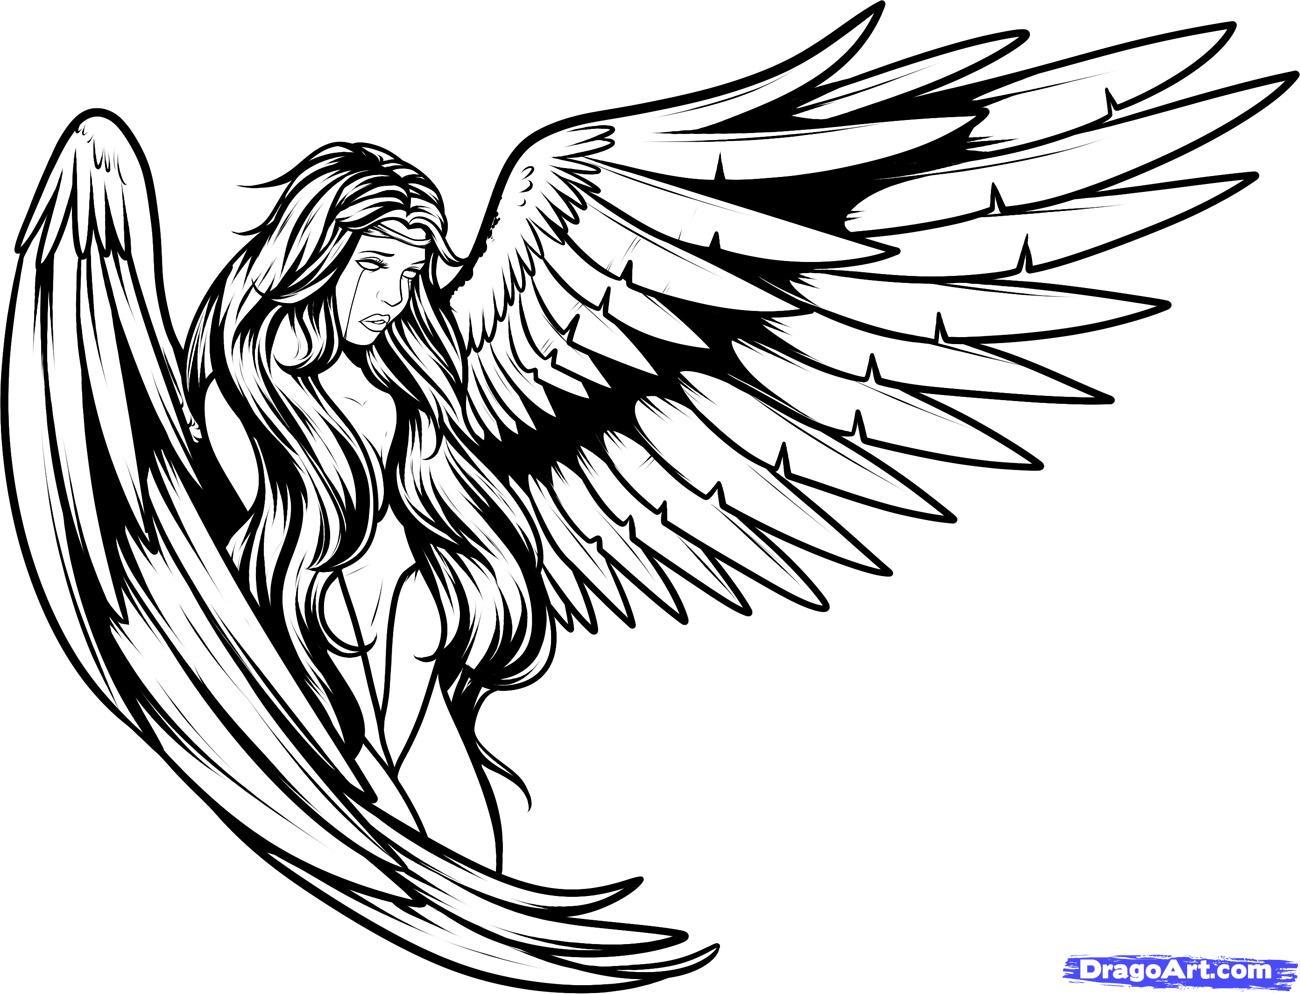 Angel outline drawing free download best angel outline